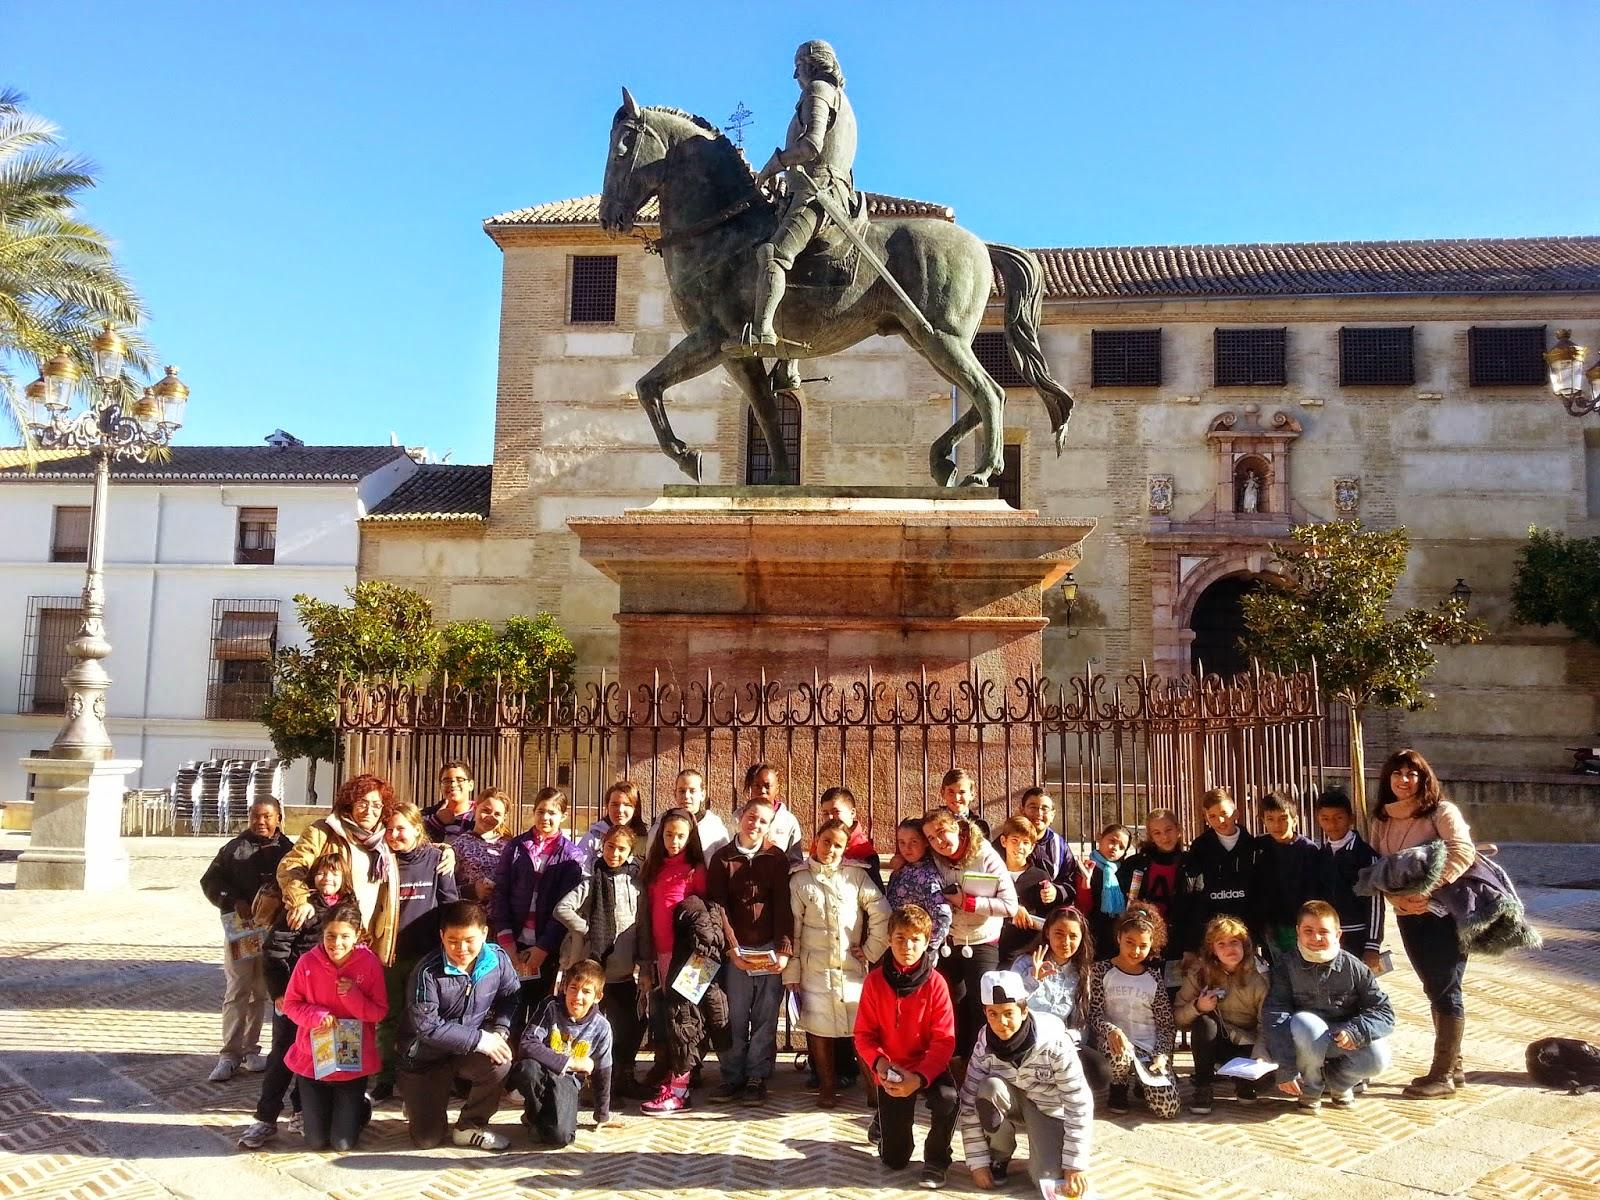 http://eltorcaltercerciclo.blogspot.com.es/2014/12/visita-conjunto-dolmenes-de-la-menga.html